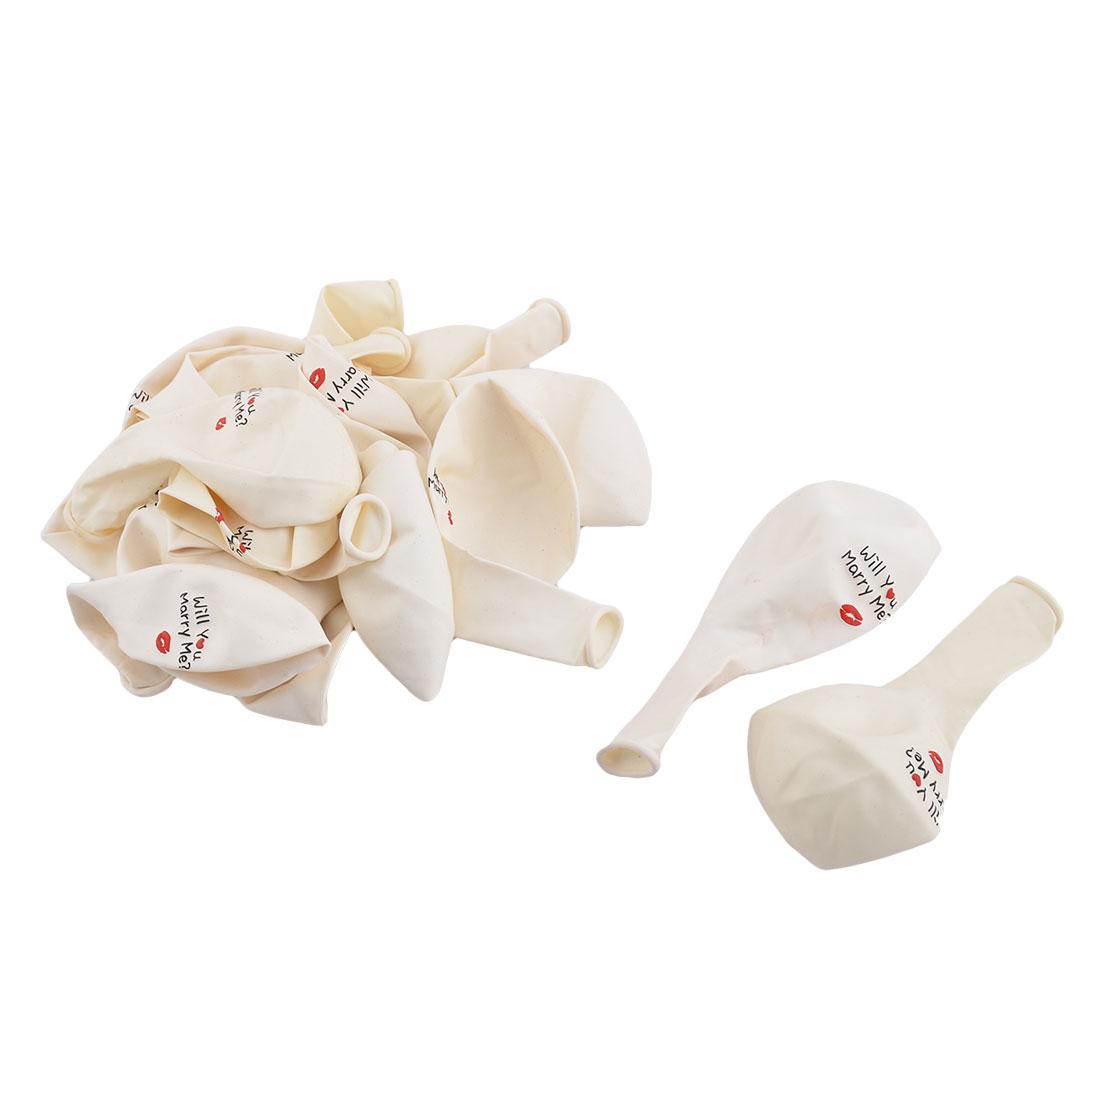 Latex Letter Lip Print Round Design Inflation Balloon Wedding Party Celebration Ornament White 11.8 Inch 20pcs